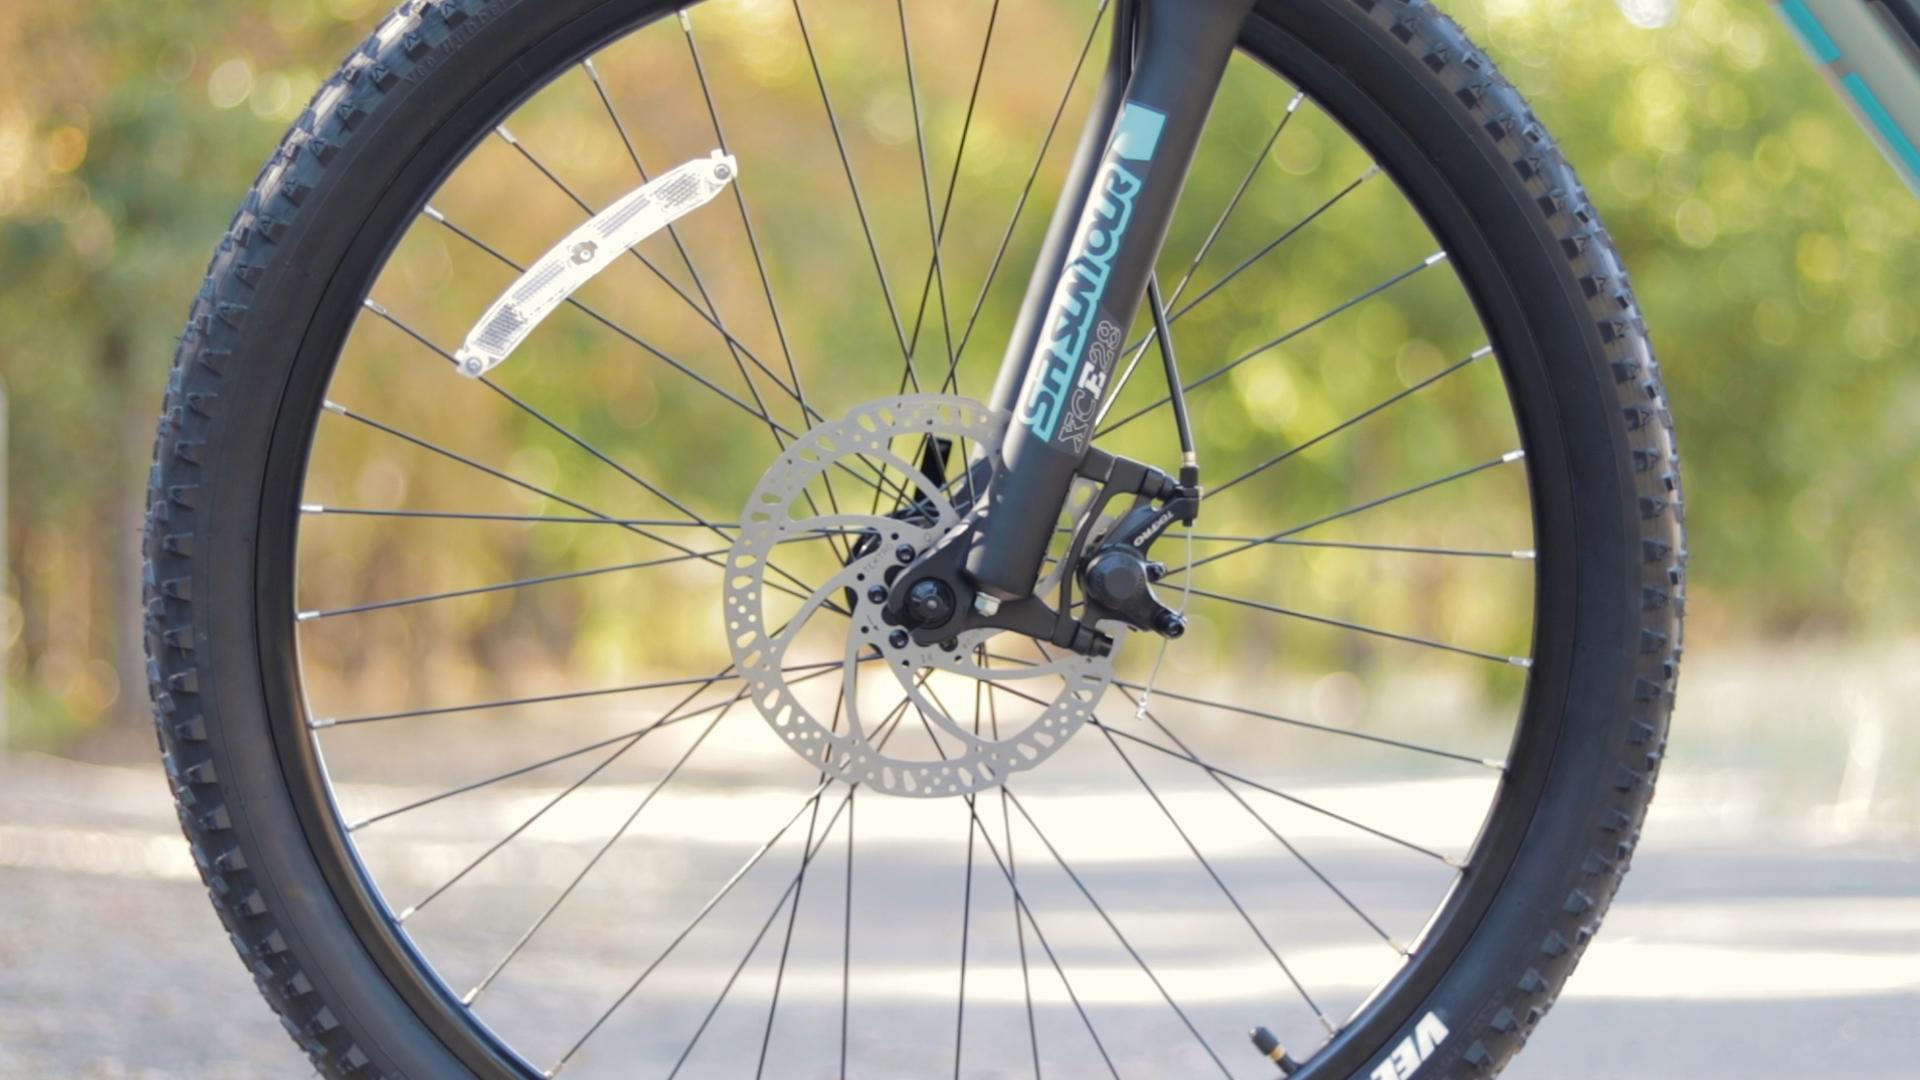 electrified-reviews-izip-trlz-electric-bike-review-tektro-disc-brakes.jpg